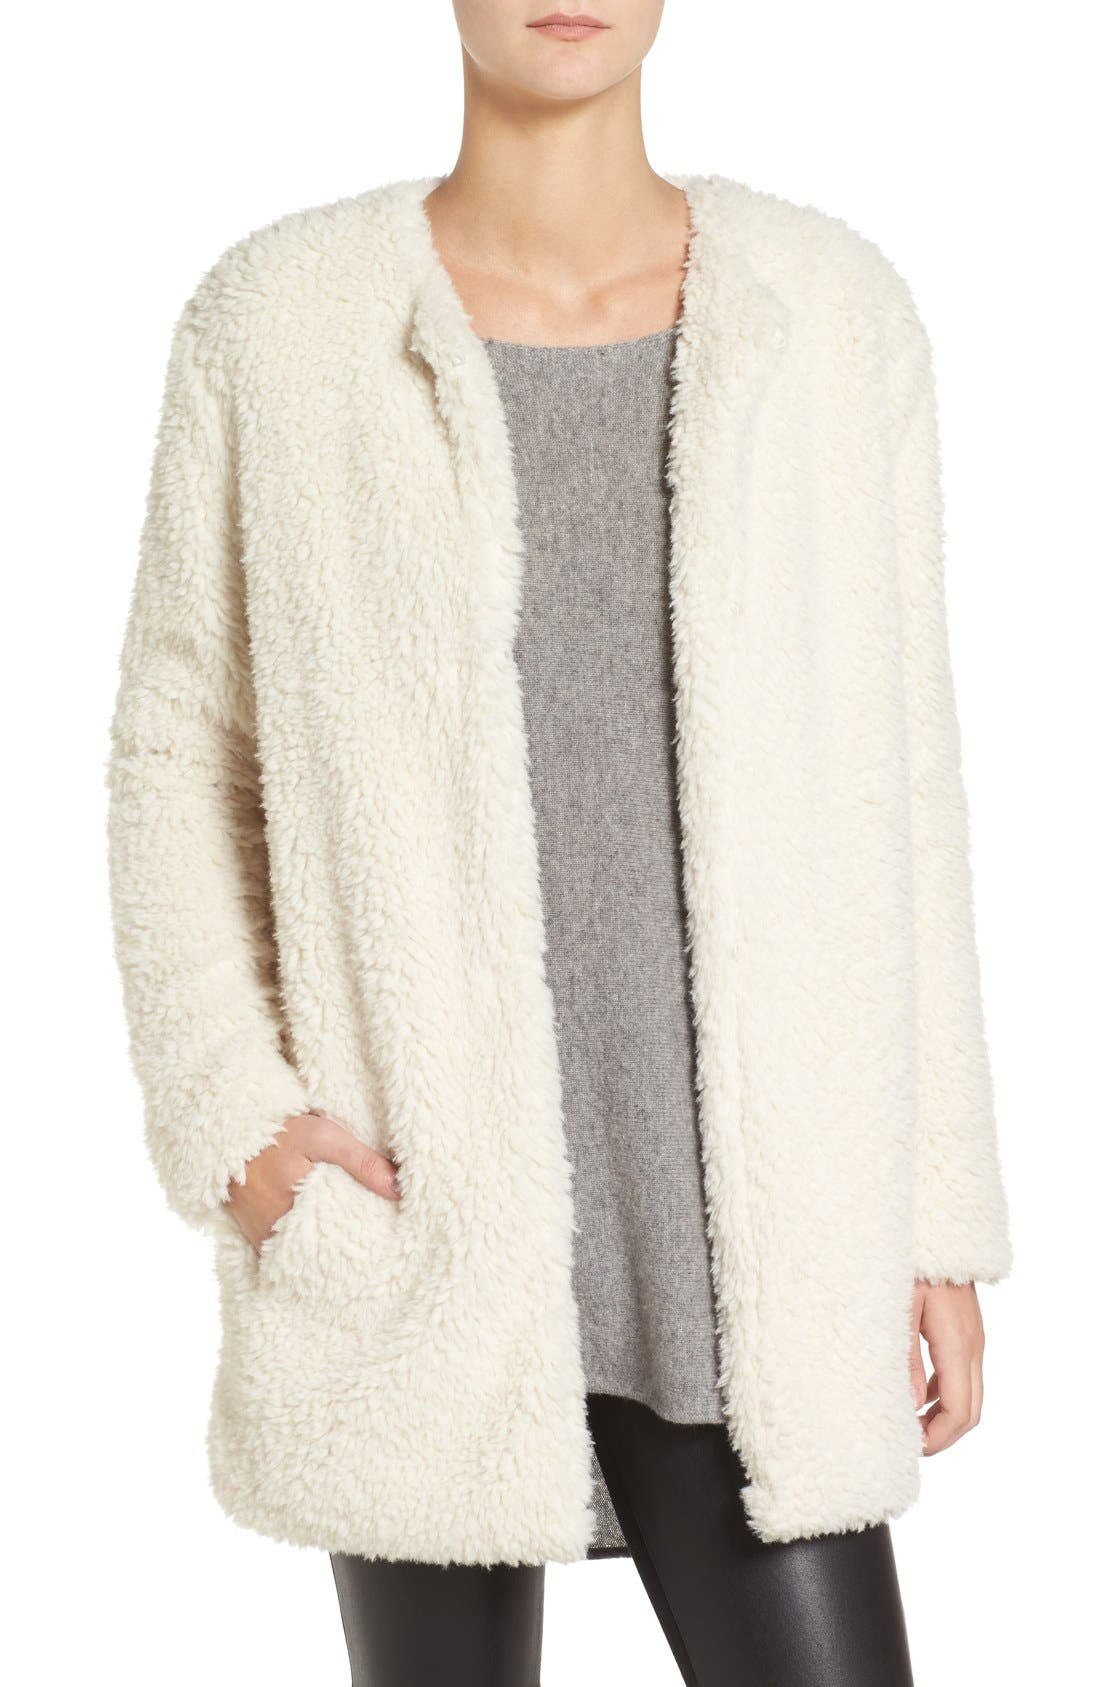 Alternate Image 1 Selected - BB Dakota Merrill Faux Fur Jacket